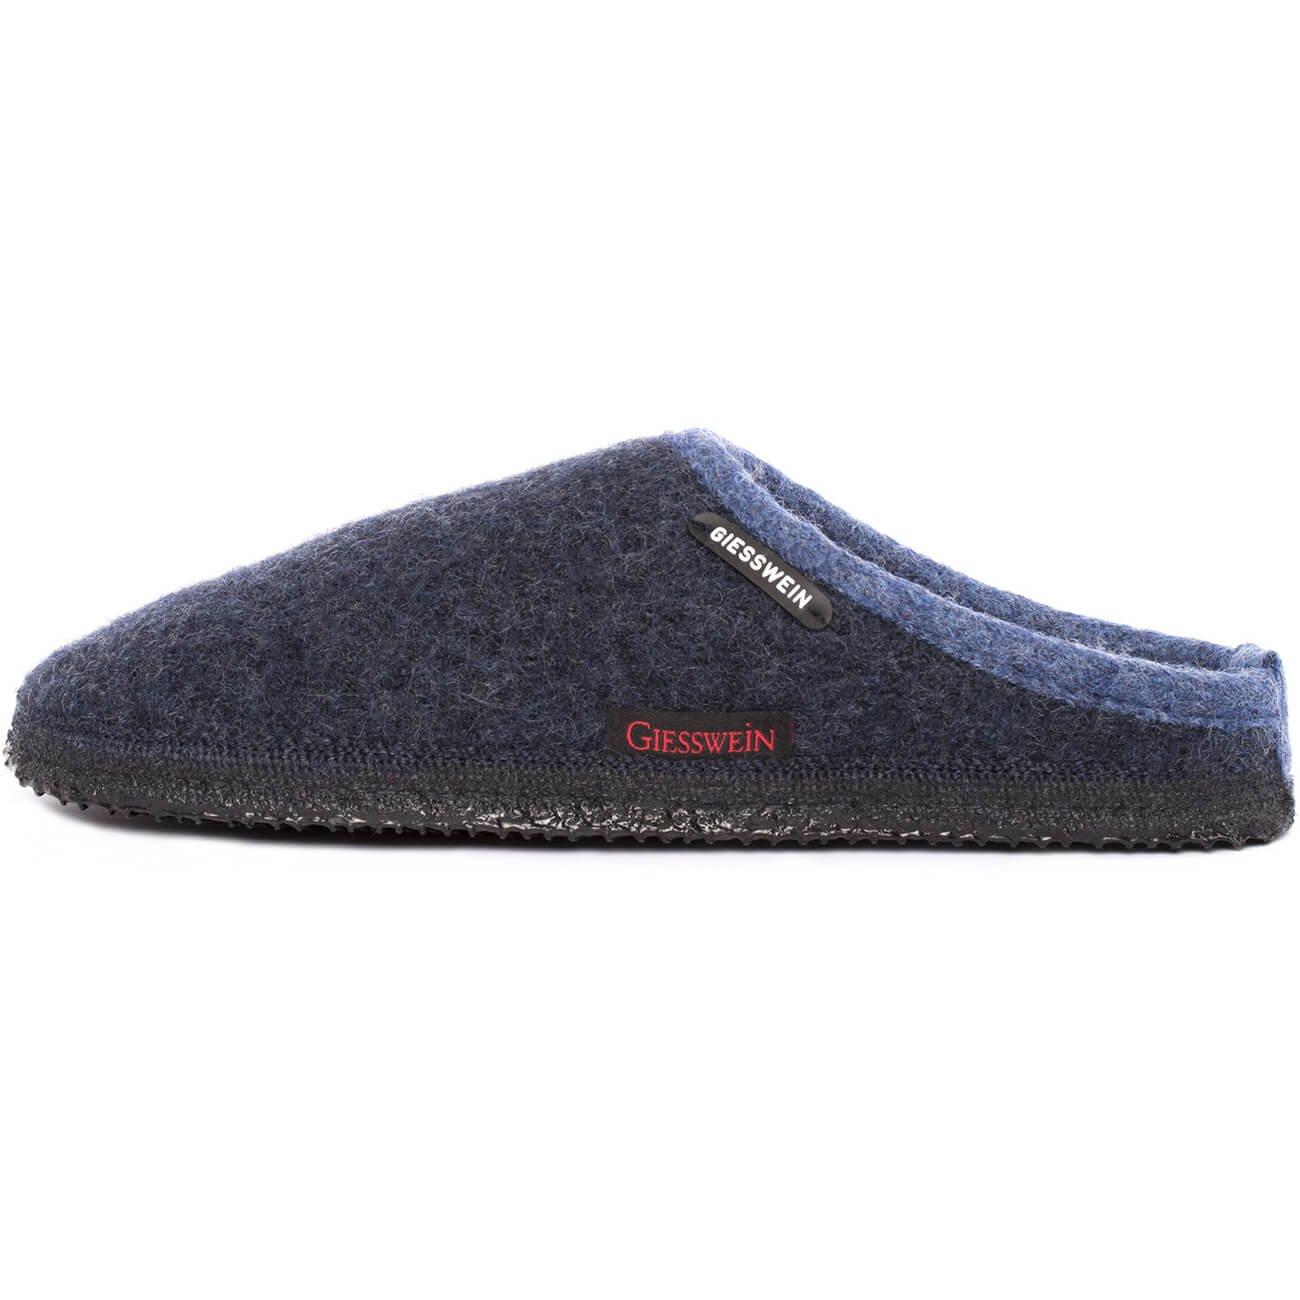 Blau (Nachtblau 514) GIESSWeiß Unisex-Erwachsene P. Dannheim Pantoffeln